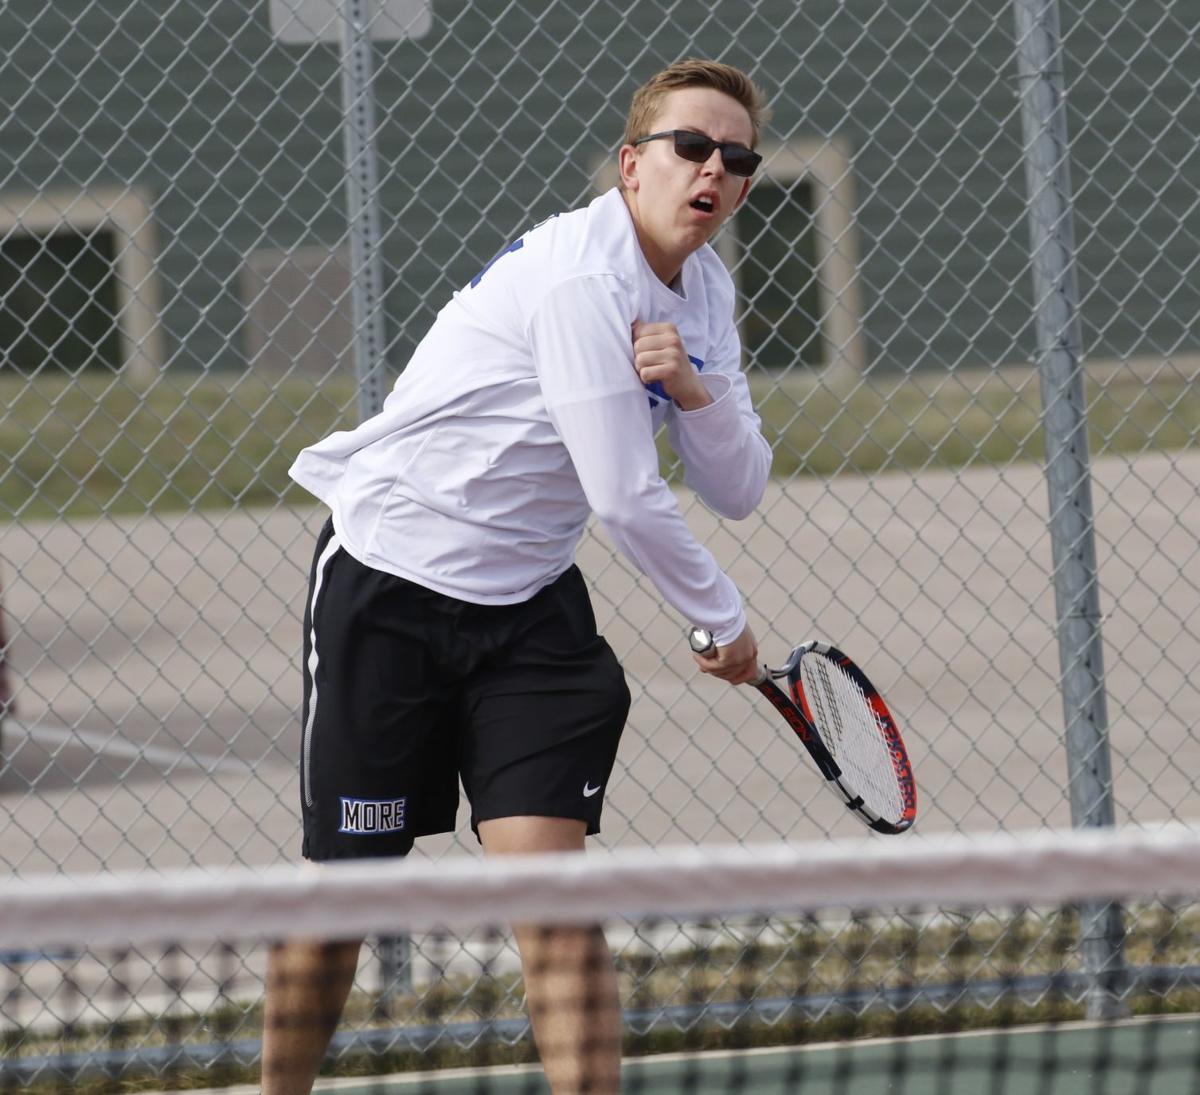 041719-spt-tennis004